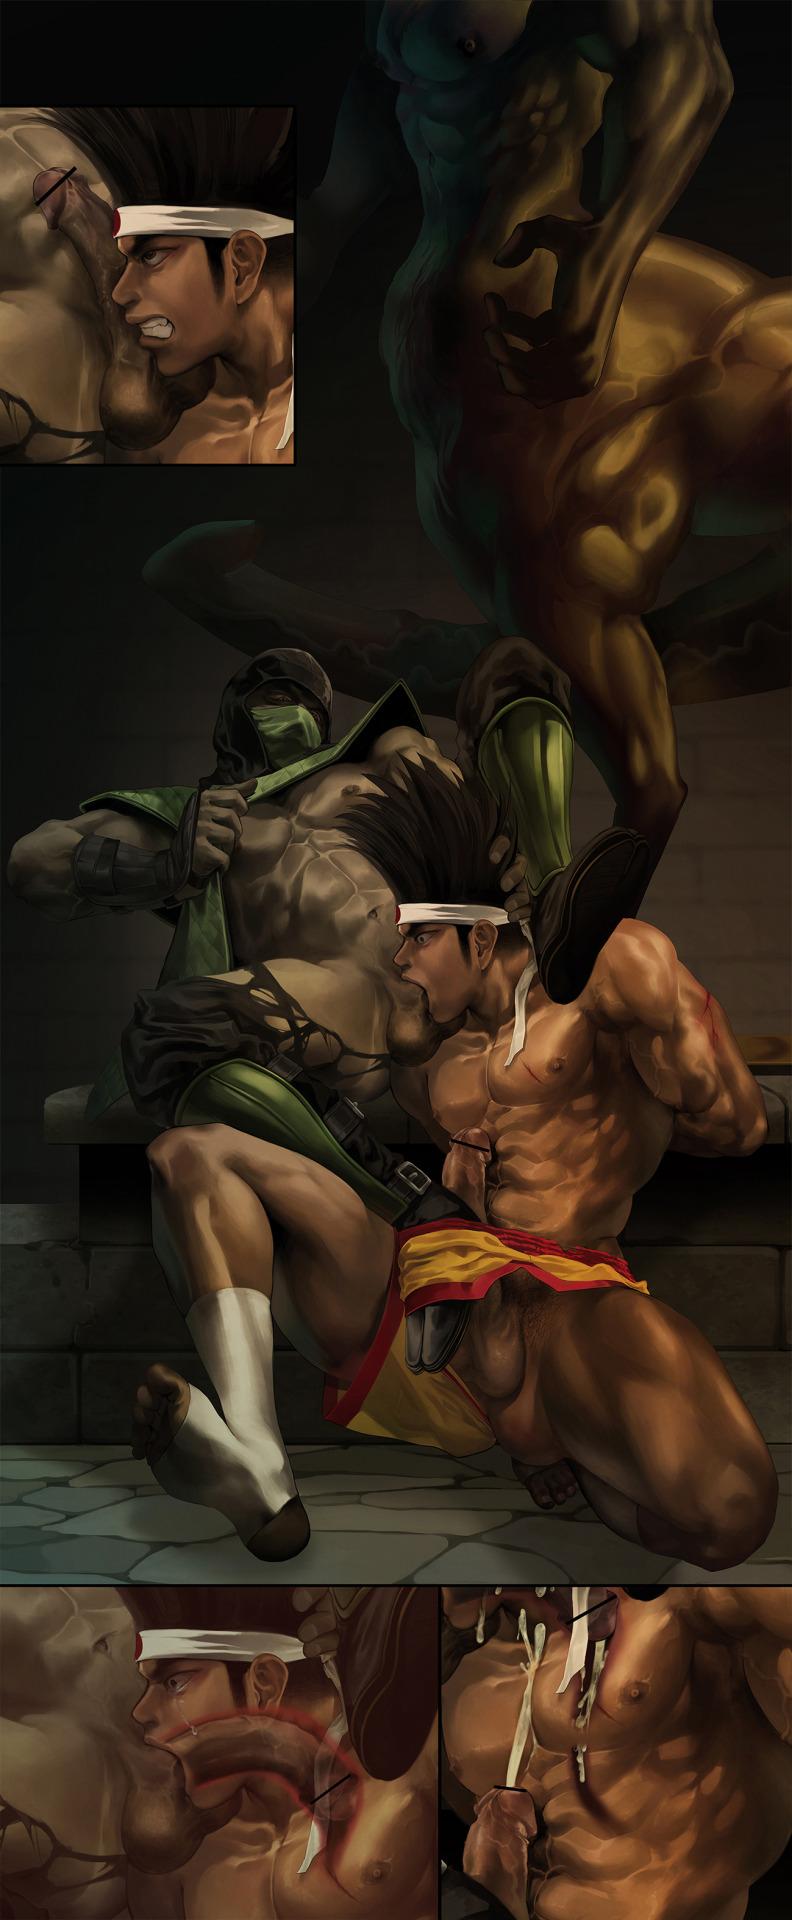 Mortal Kombat Hot Lesbians Fucking